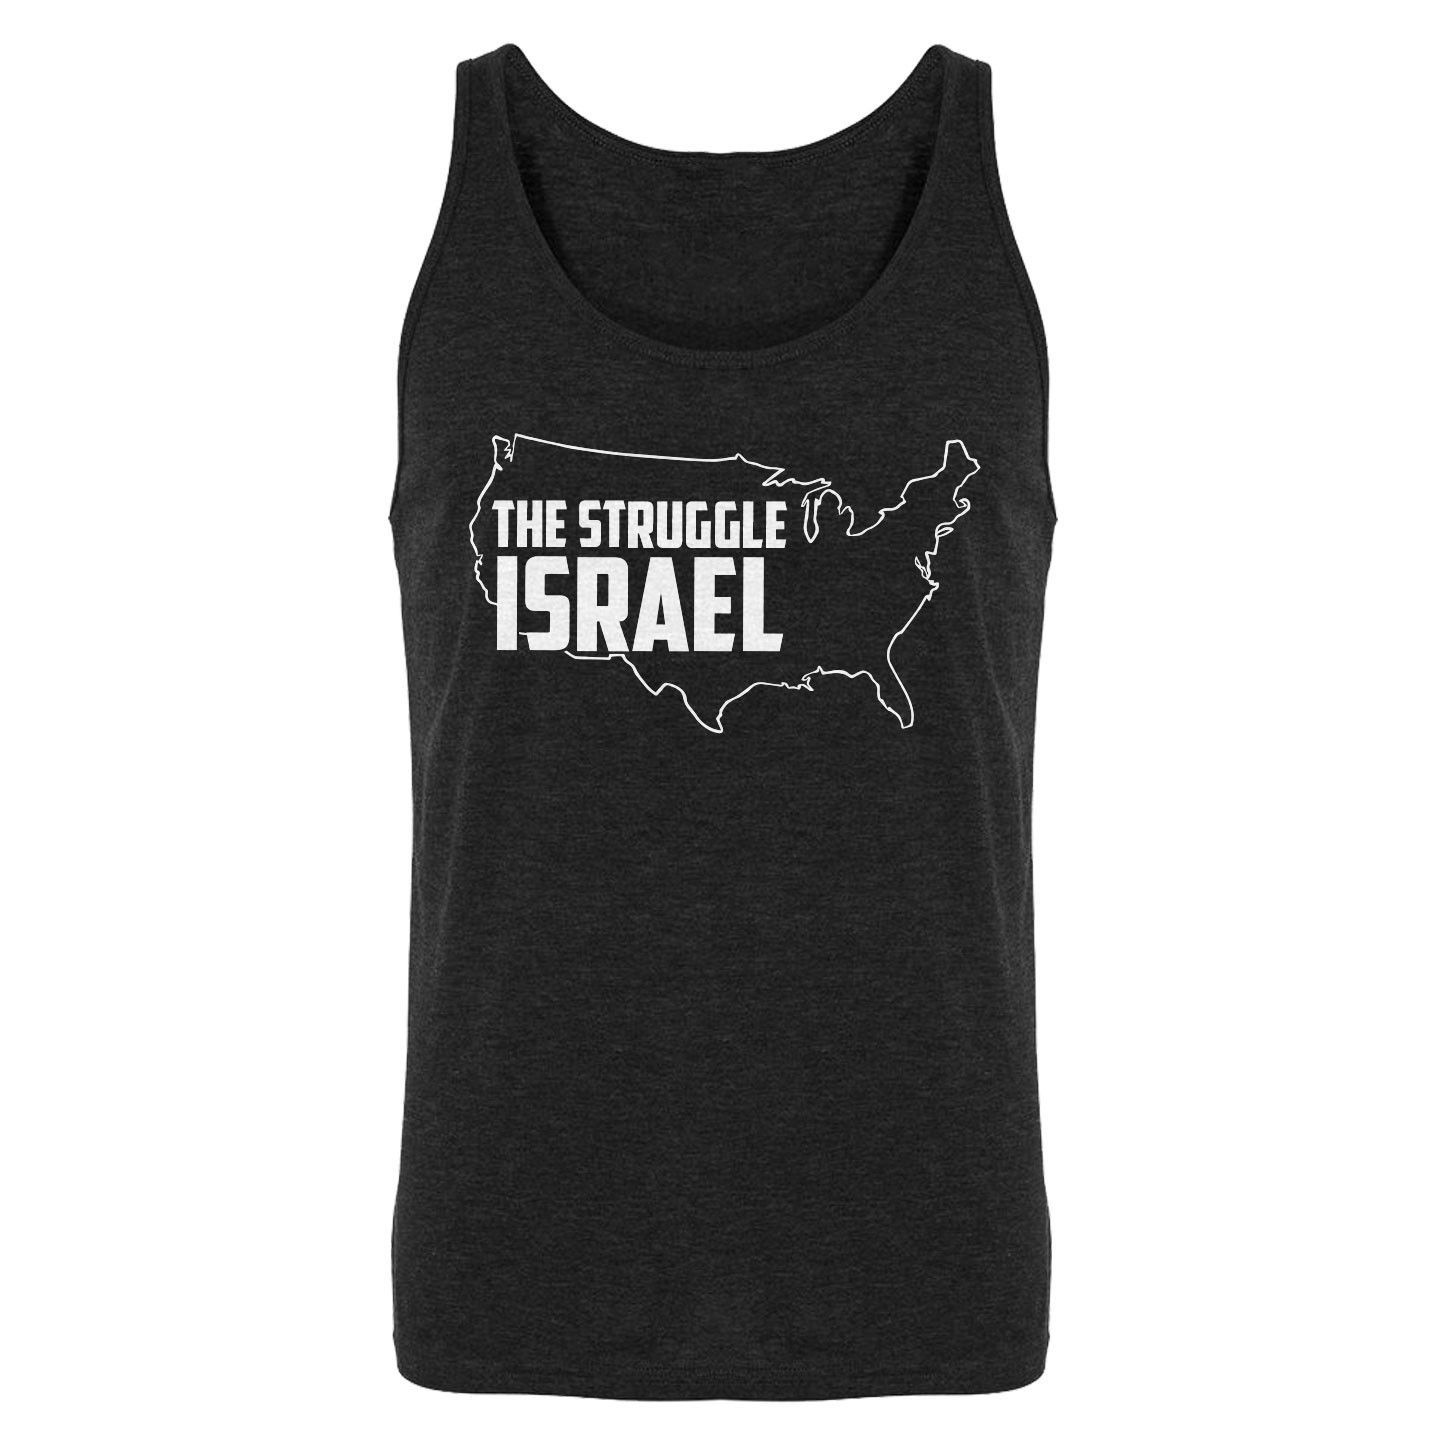 The Struggle Israel Mens Sleeveless Tank Top